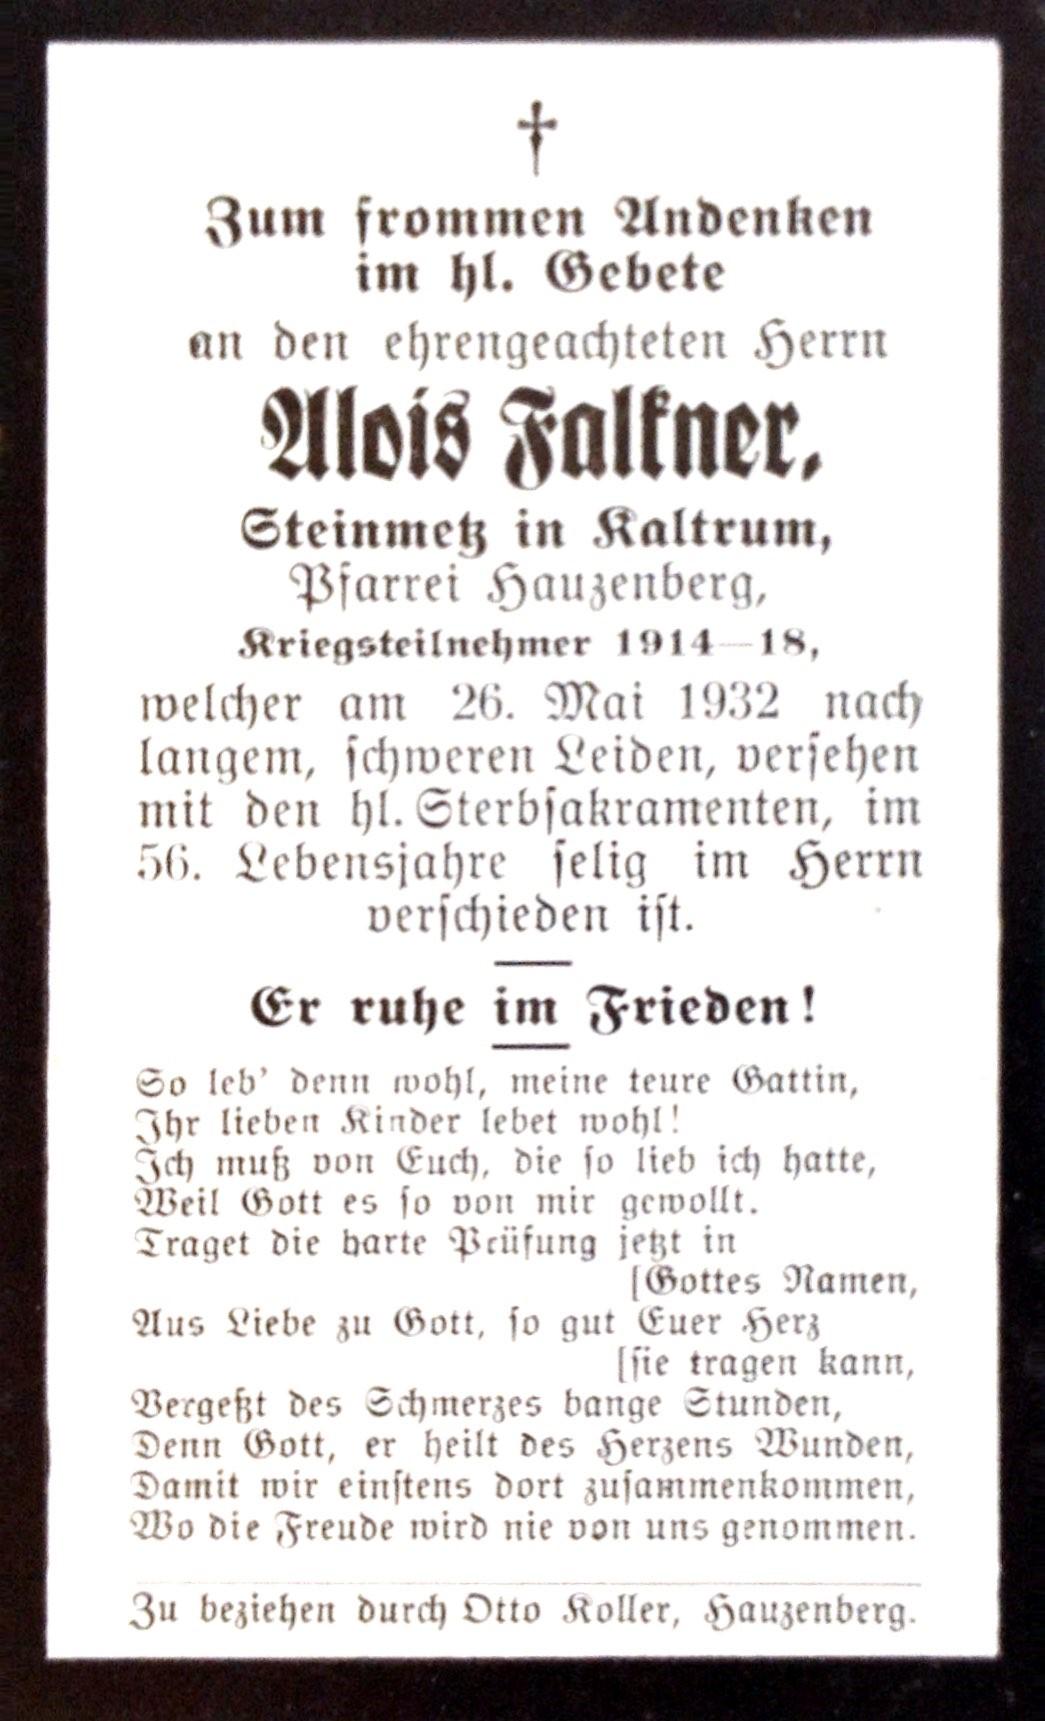 1932-05-26-Falkner-Alois-Kaltrum-Steinmetz